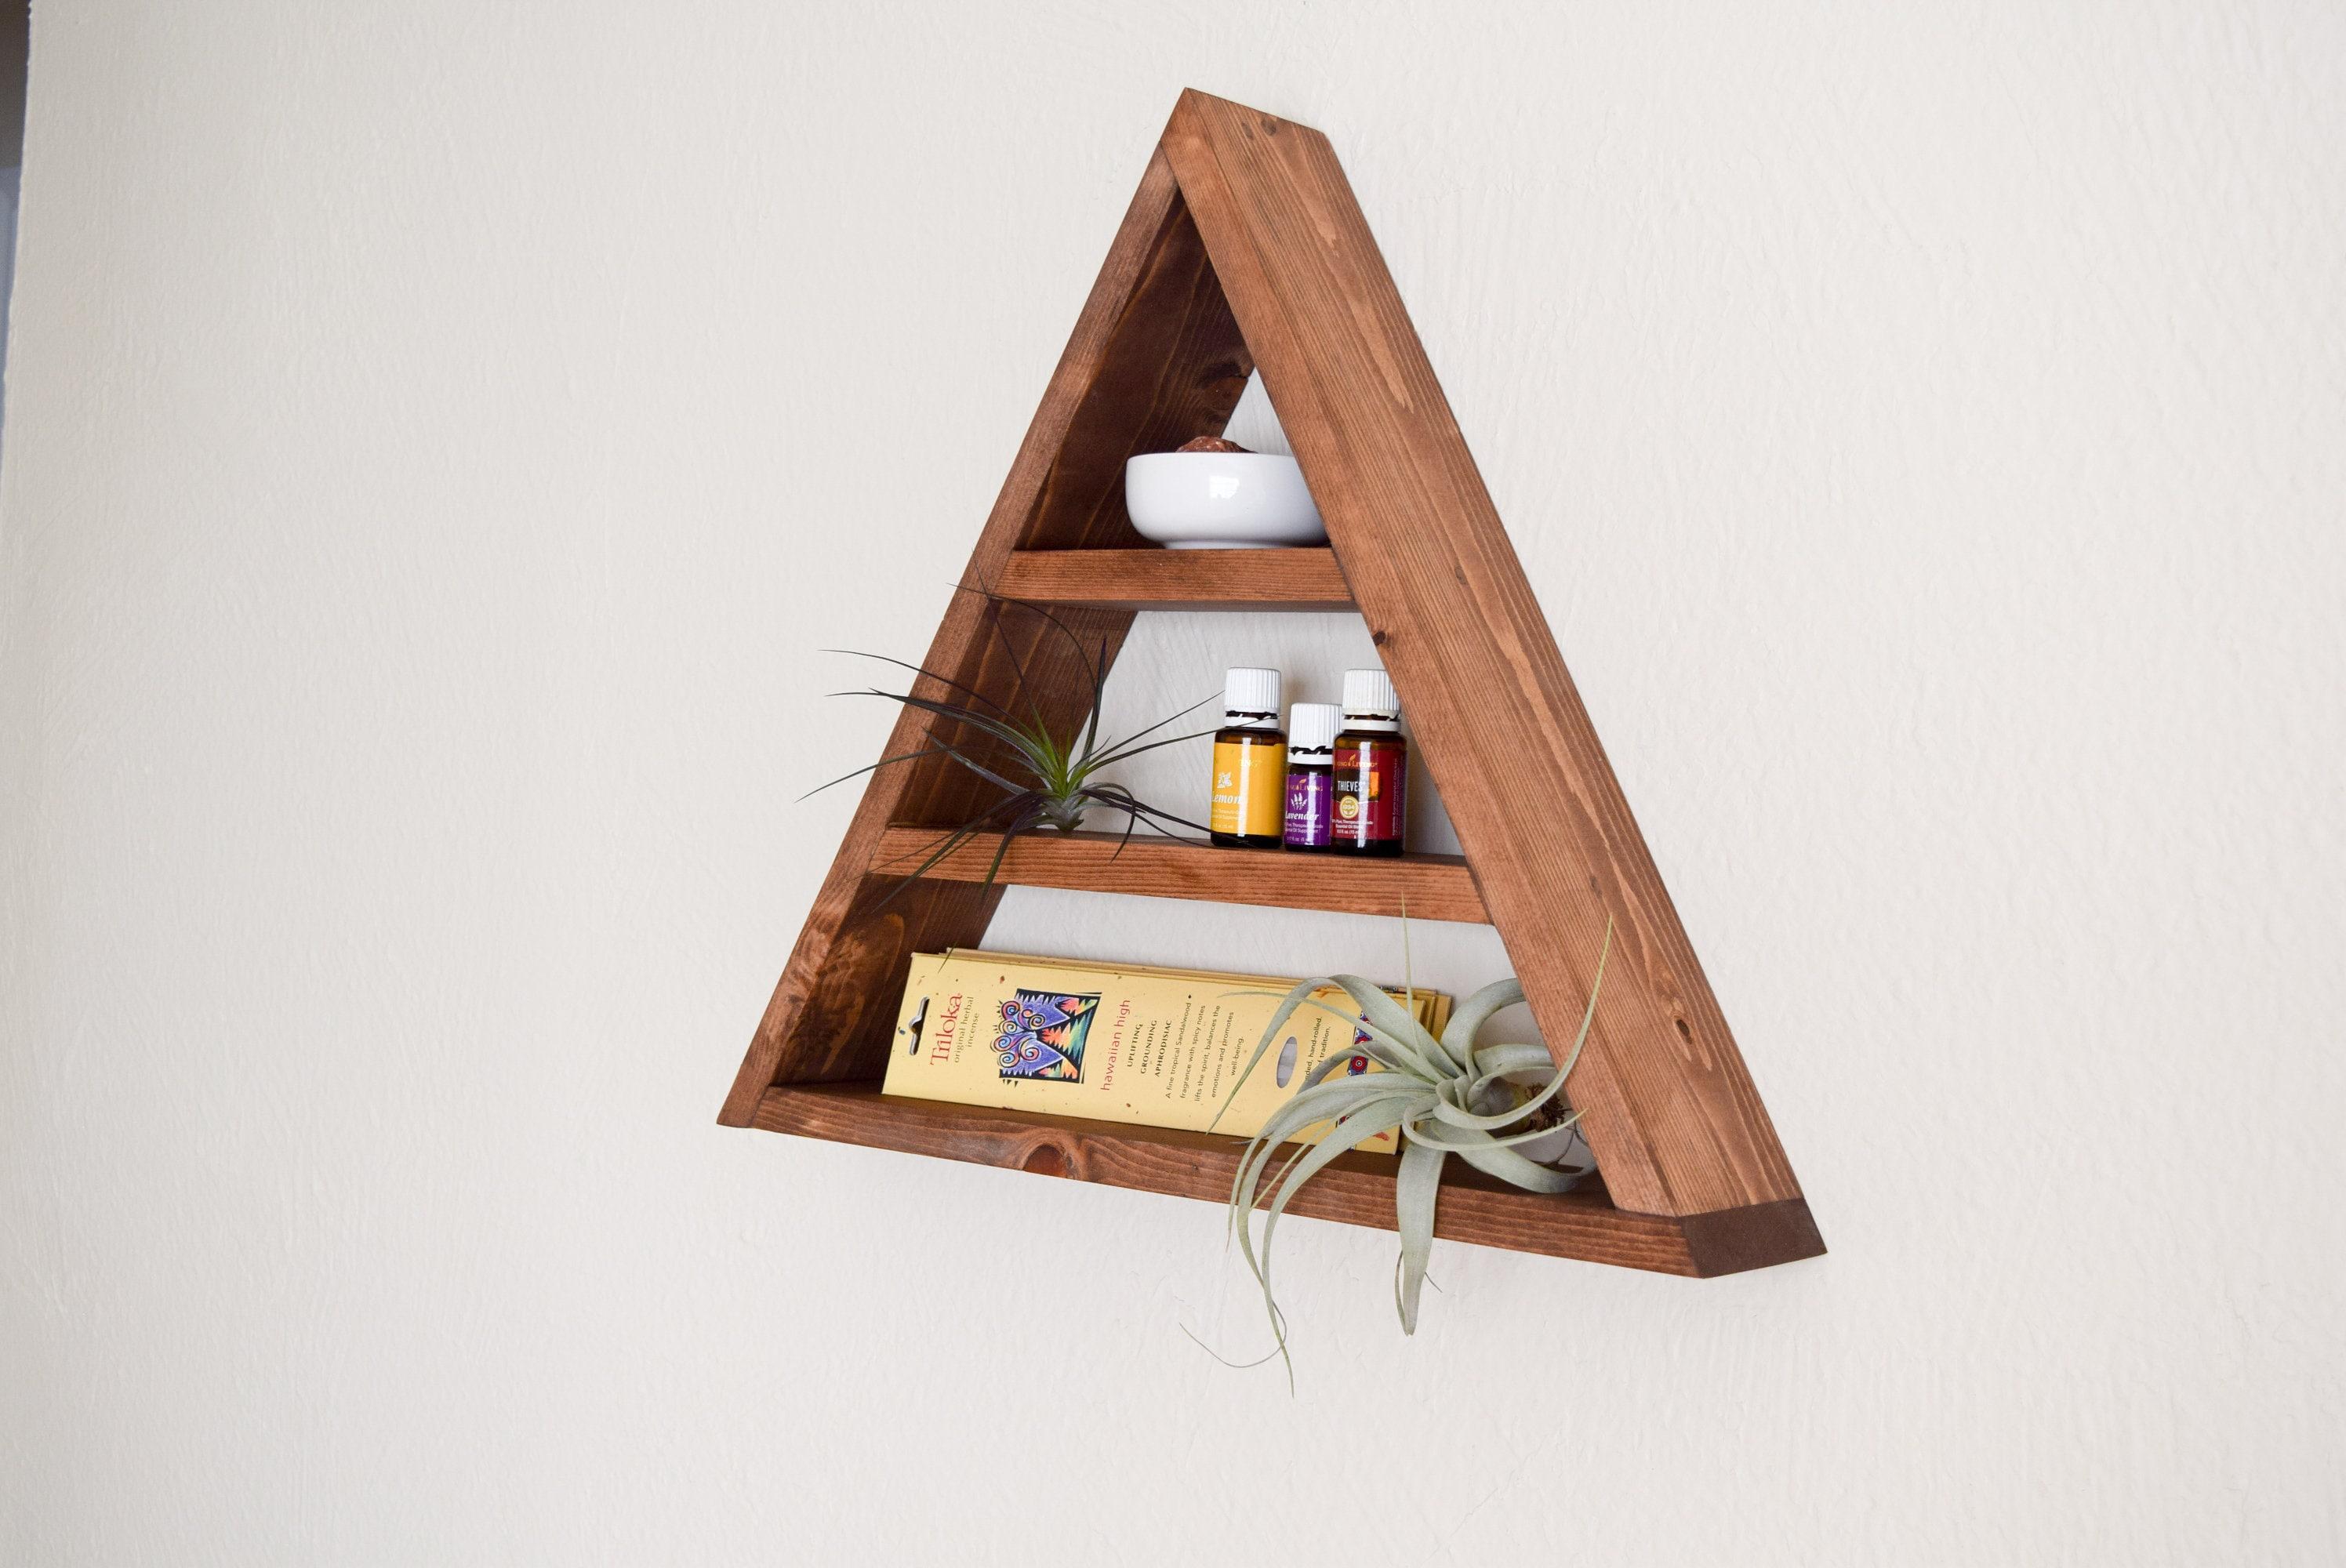 triangle shelf wood floating shelf ref= 1